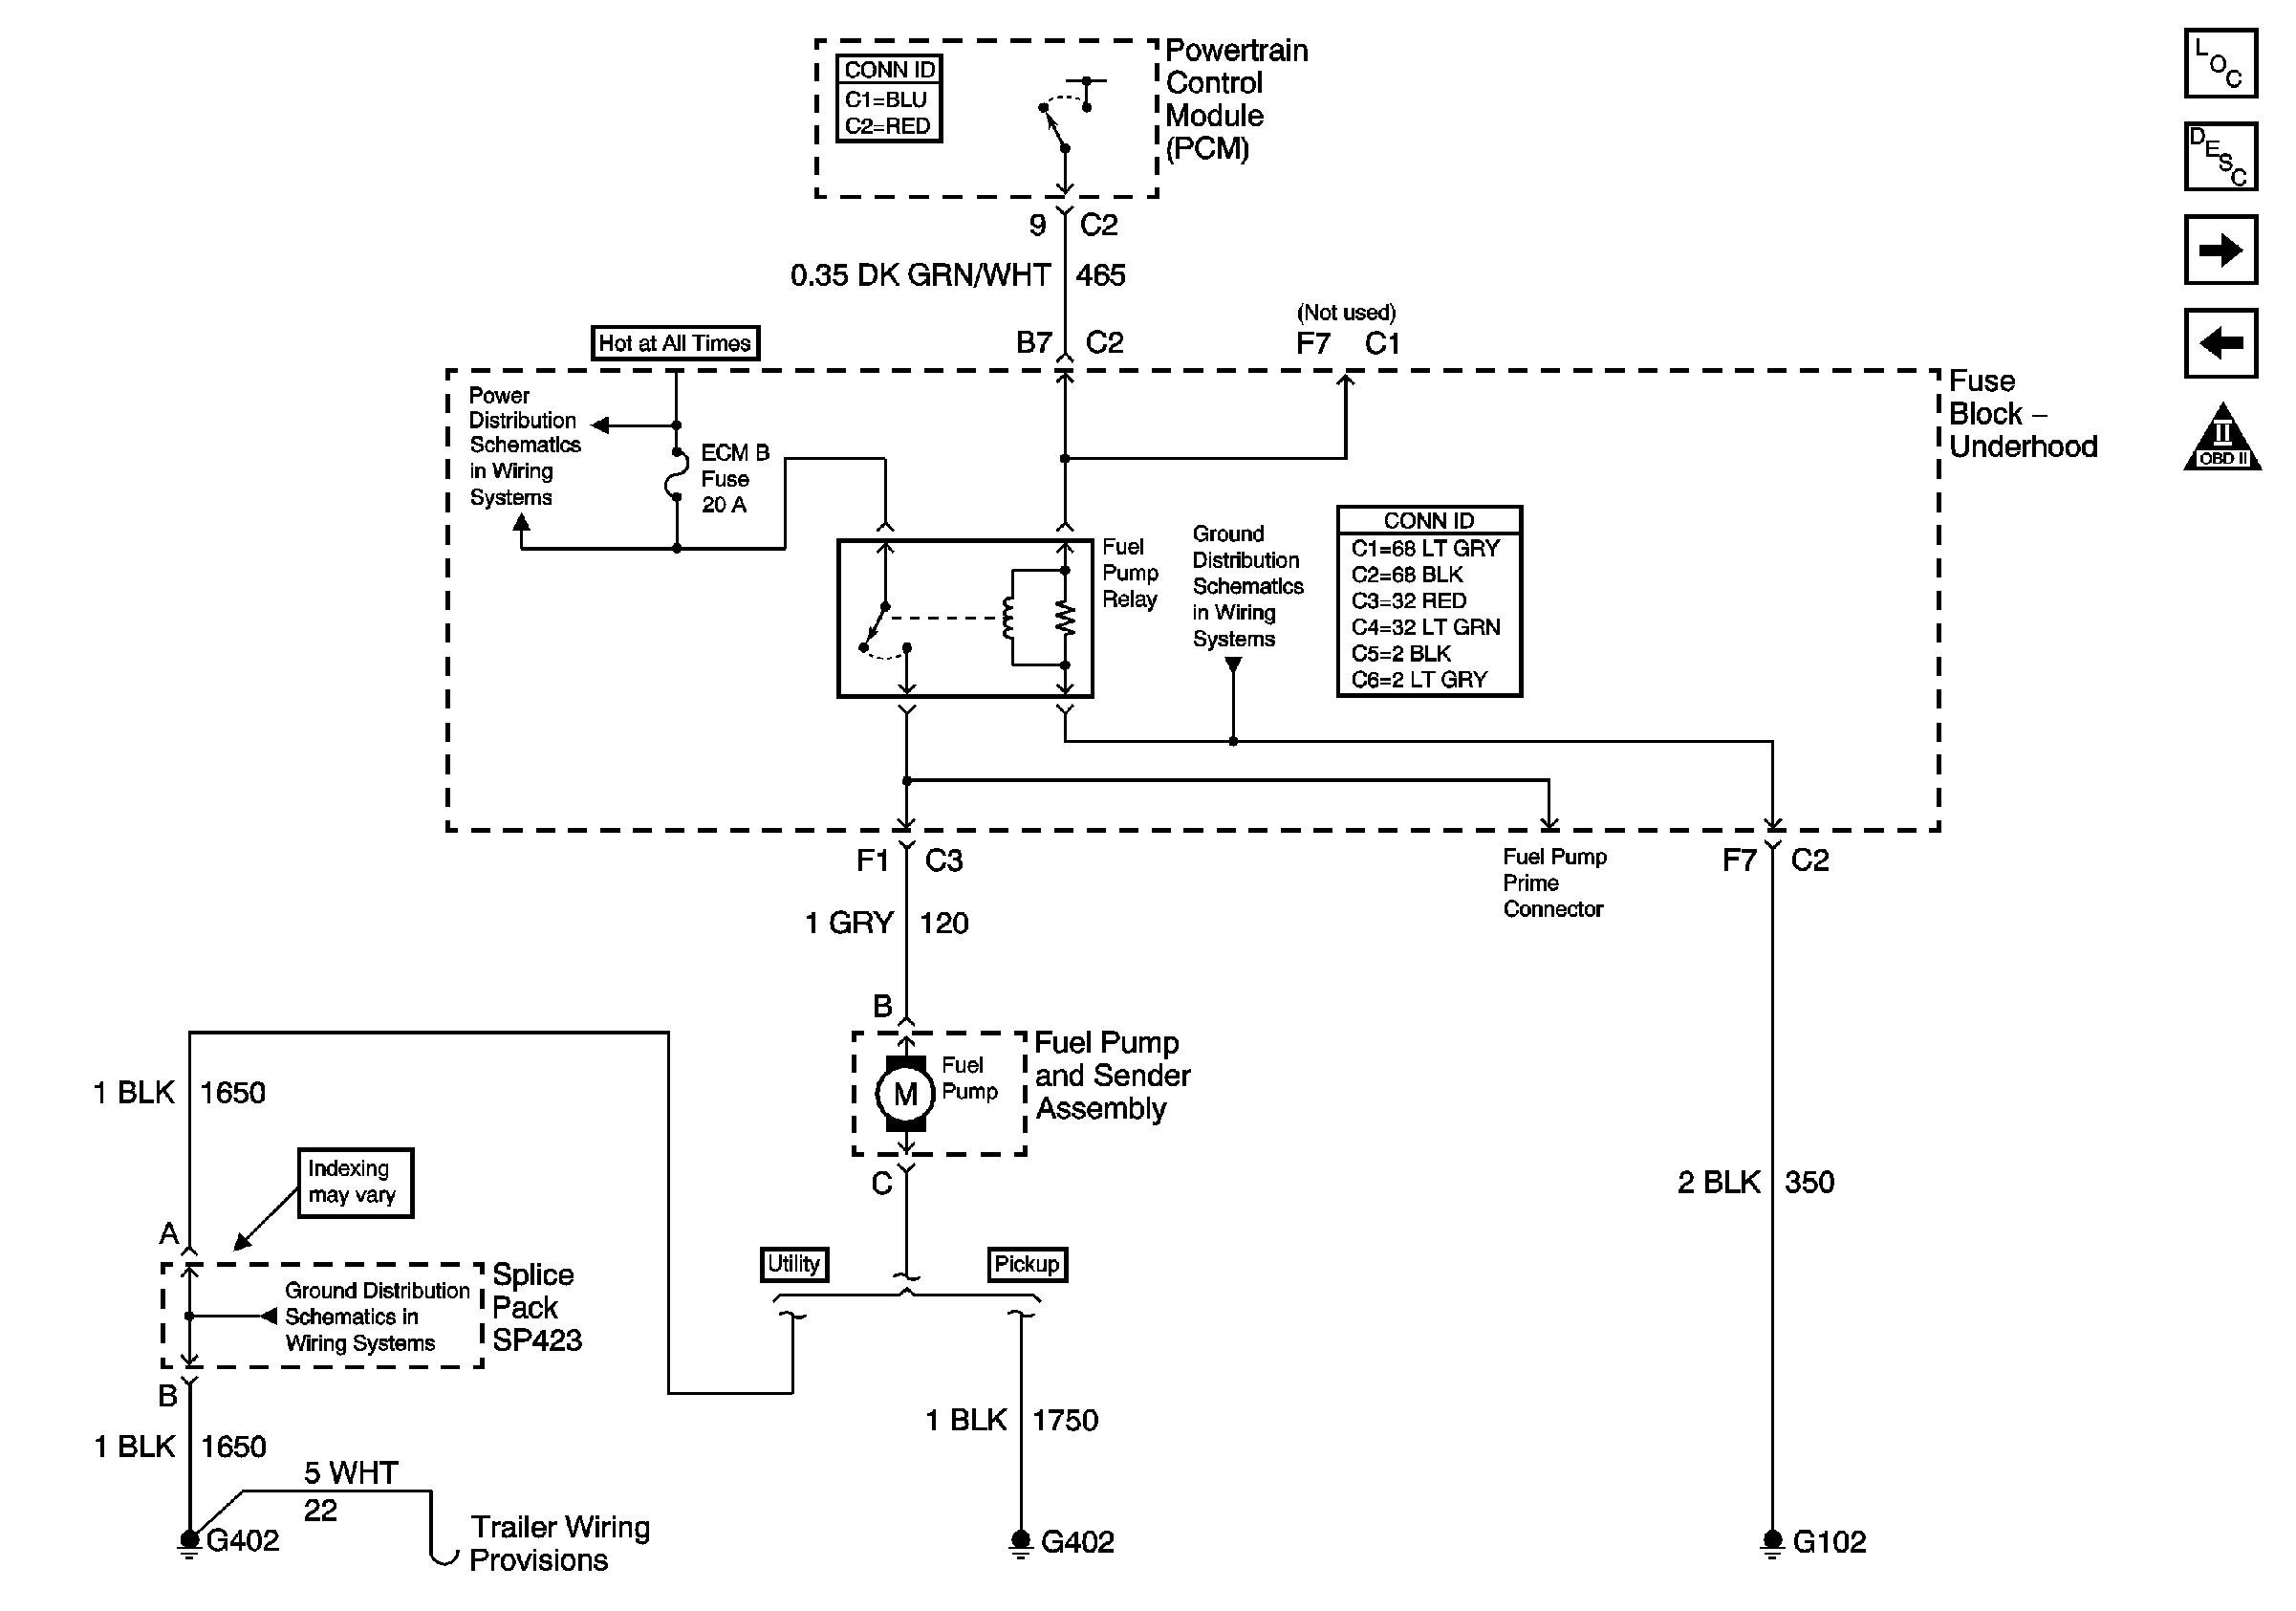 2000 Chevy S10 Wiring Diagram S10 Wiring Diagram Wiring Diagram Of 2000 Chevy S10 Wiring Diagram